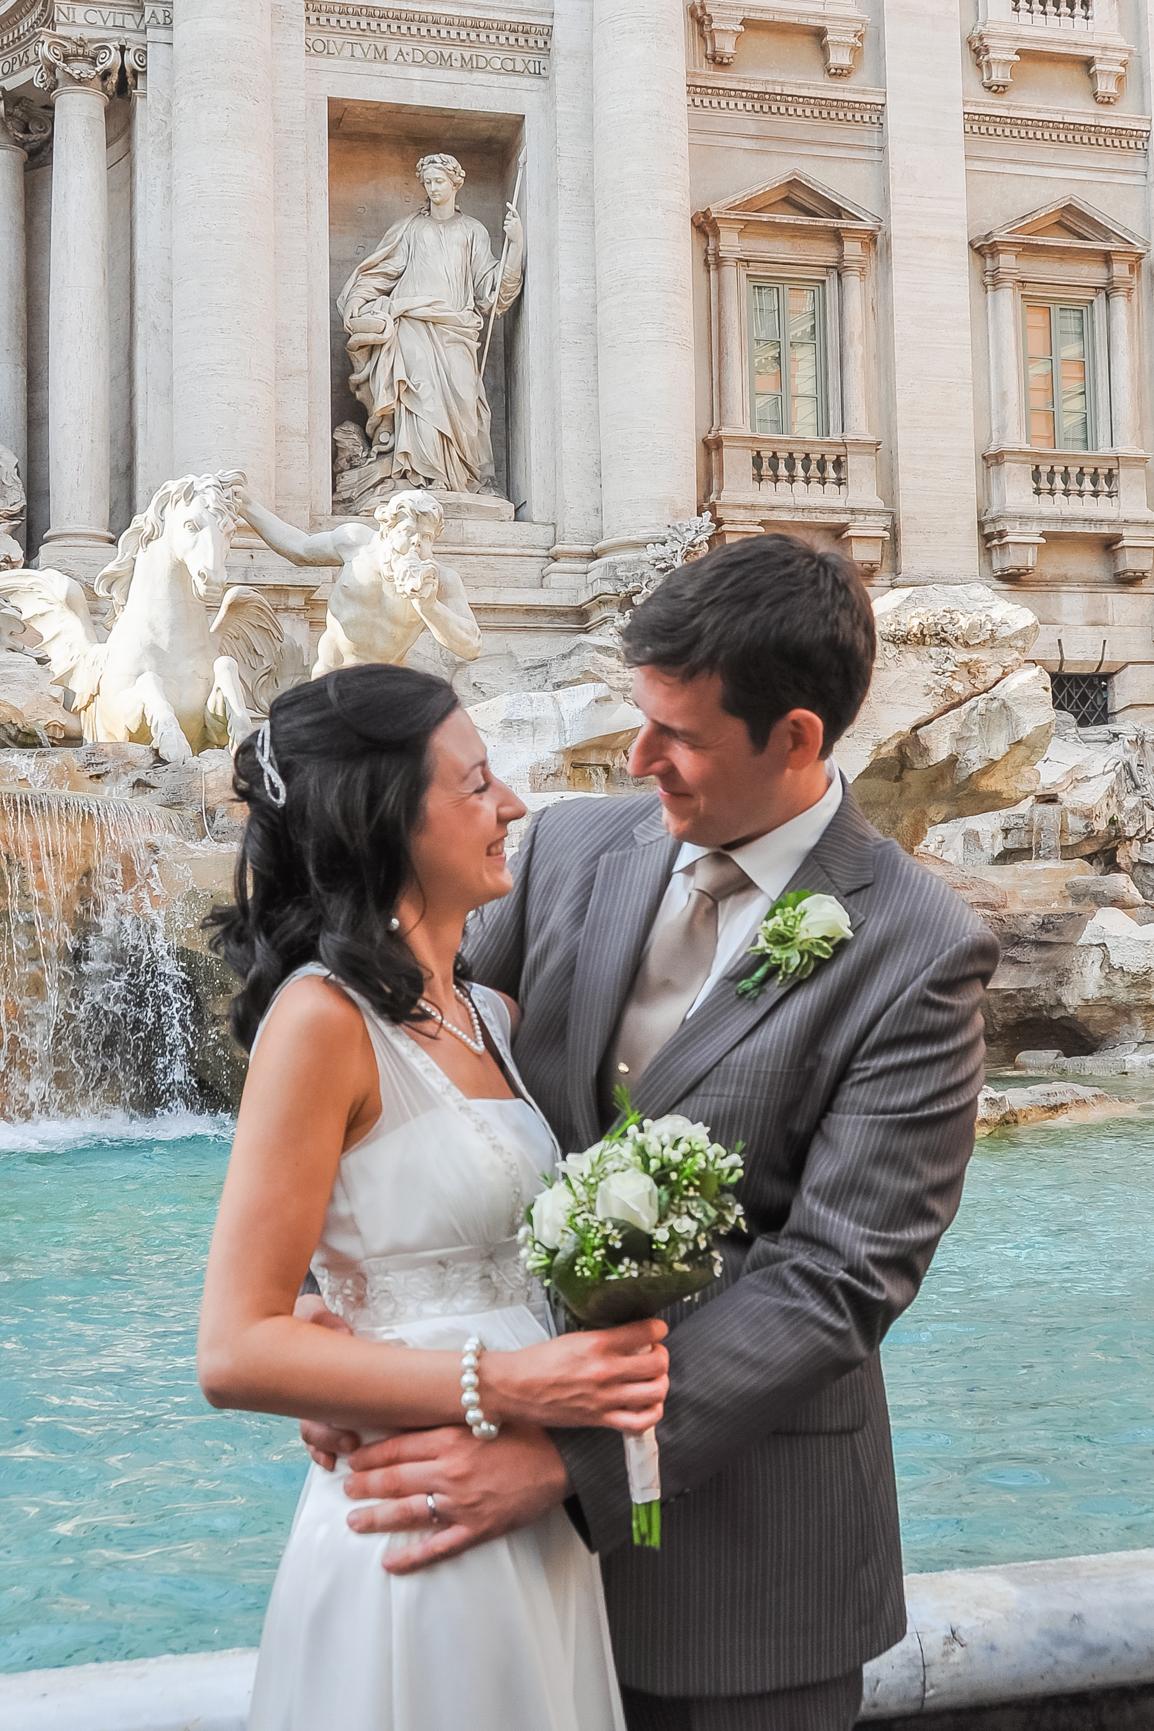 Fontana Di Trevi. Rome / Italy